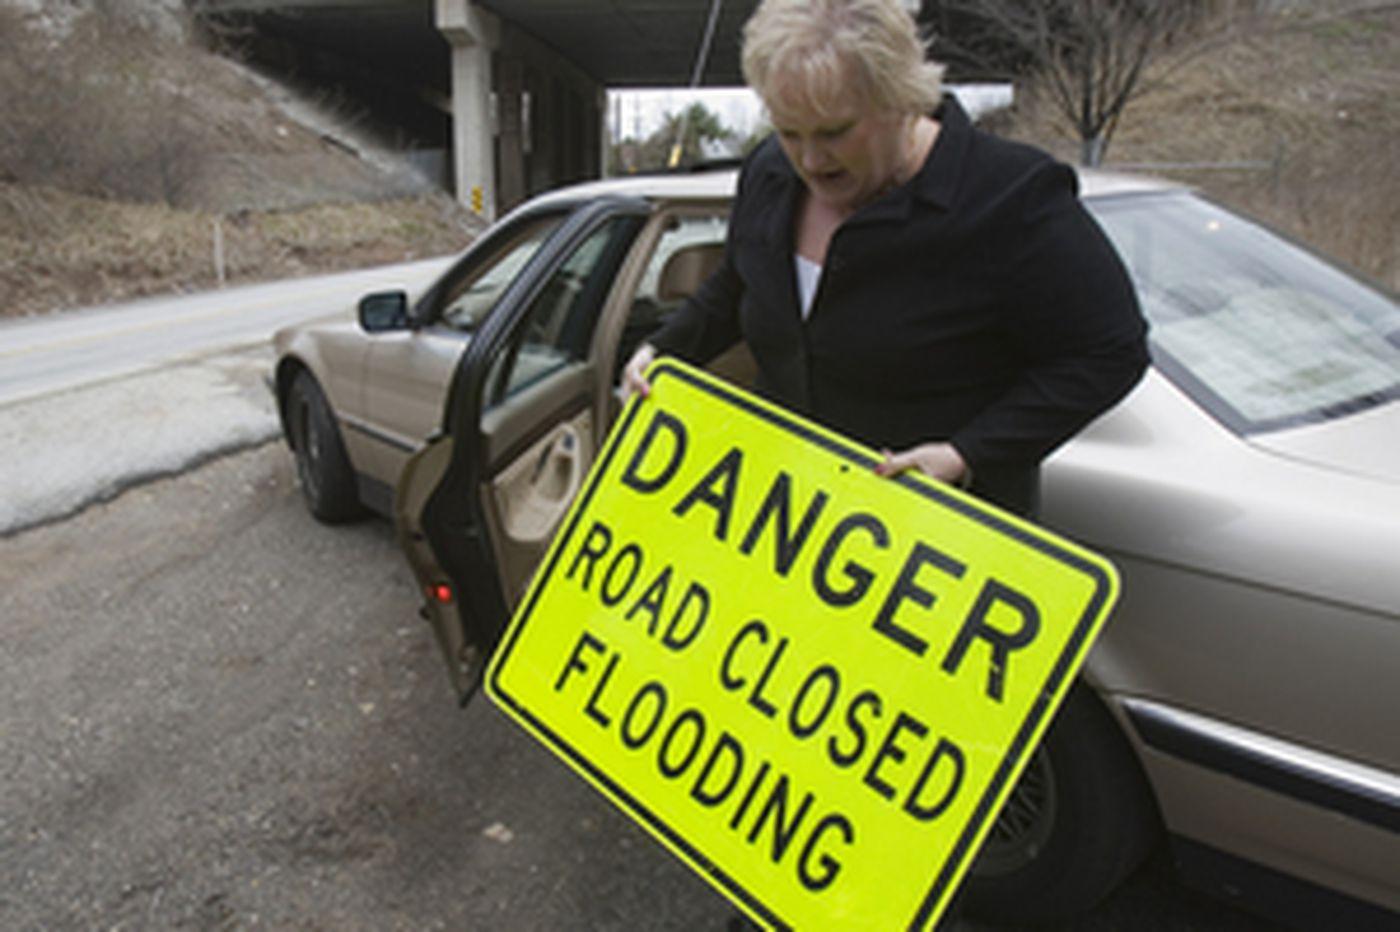 Flood control fees gain support